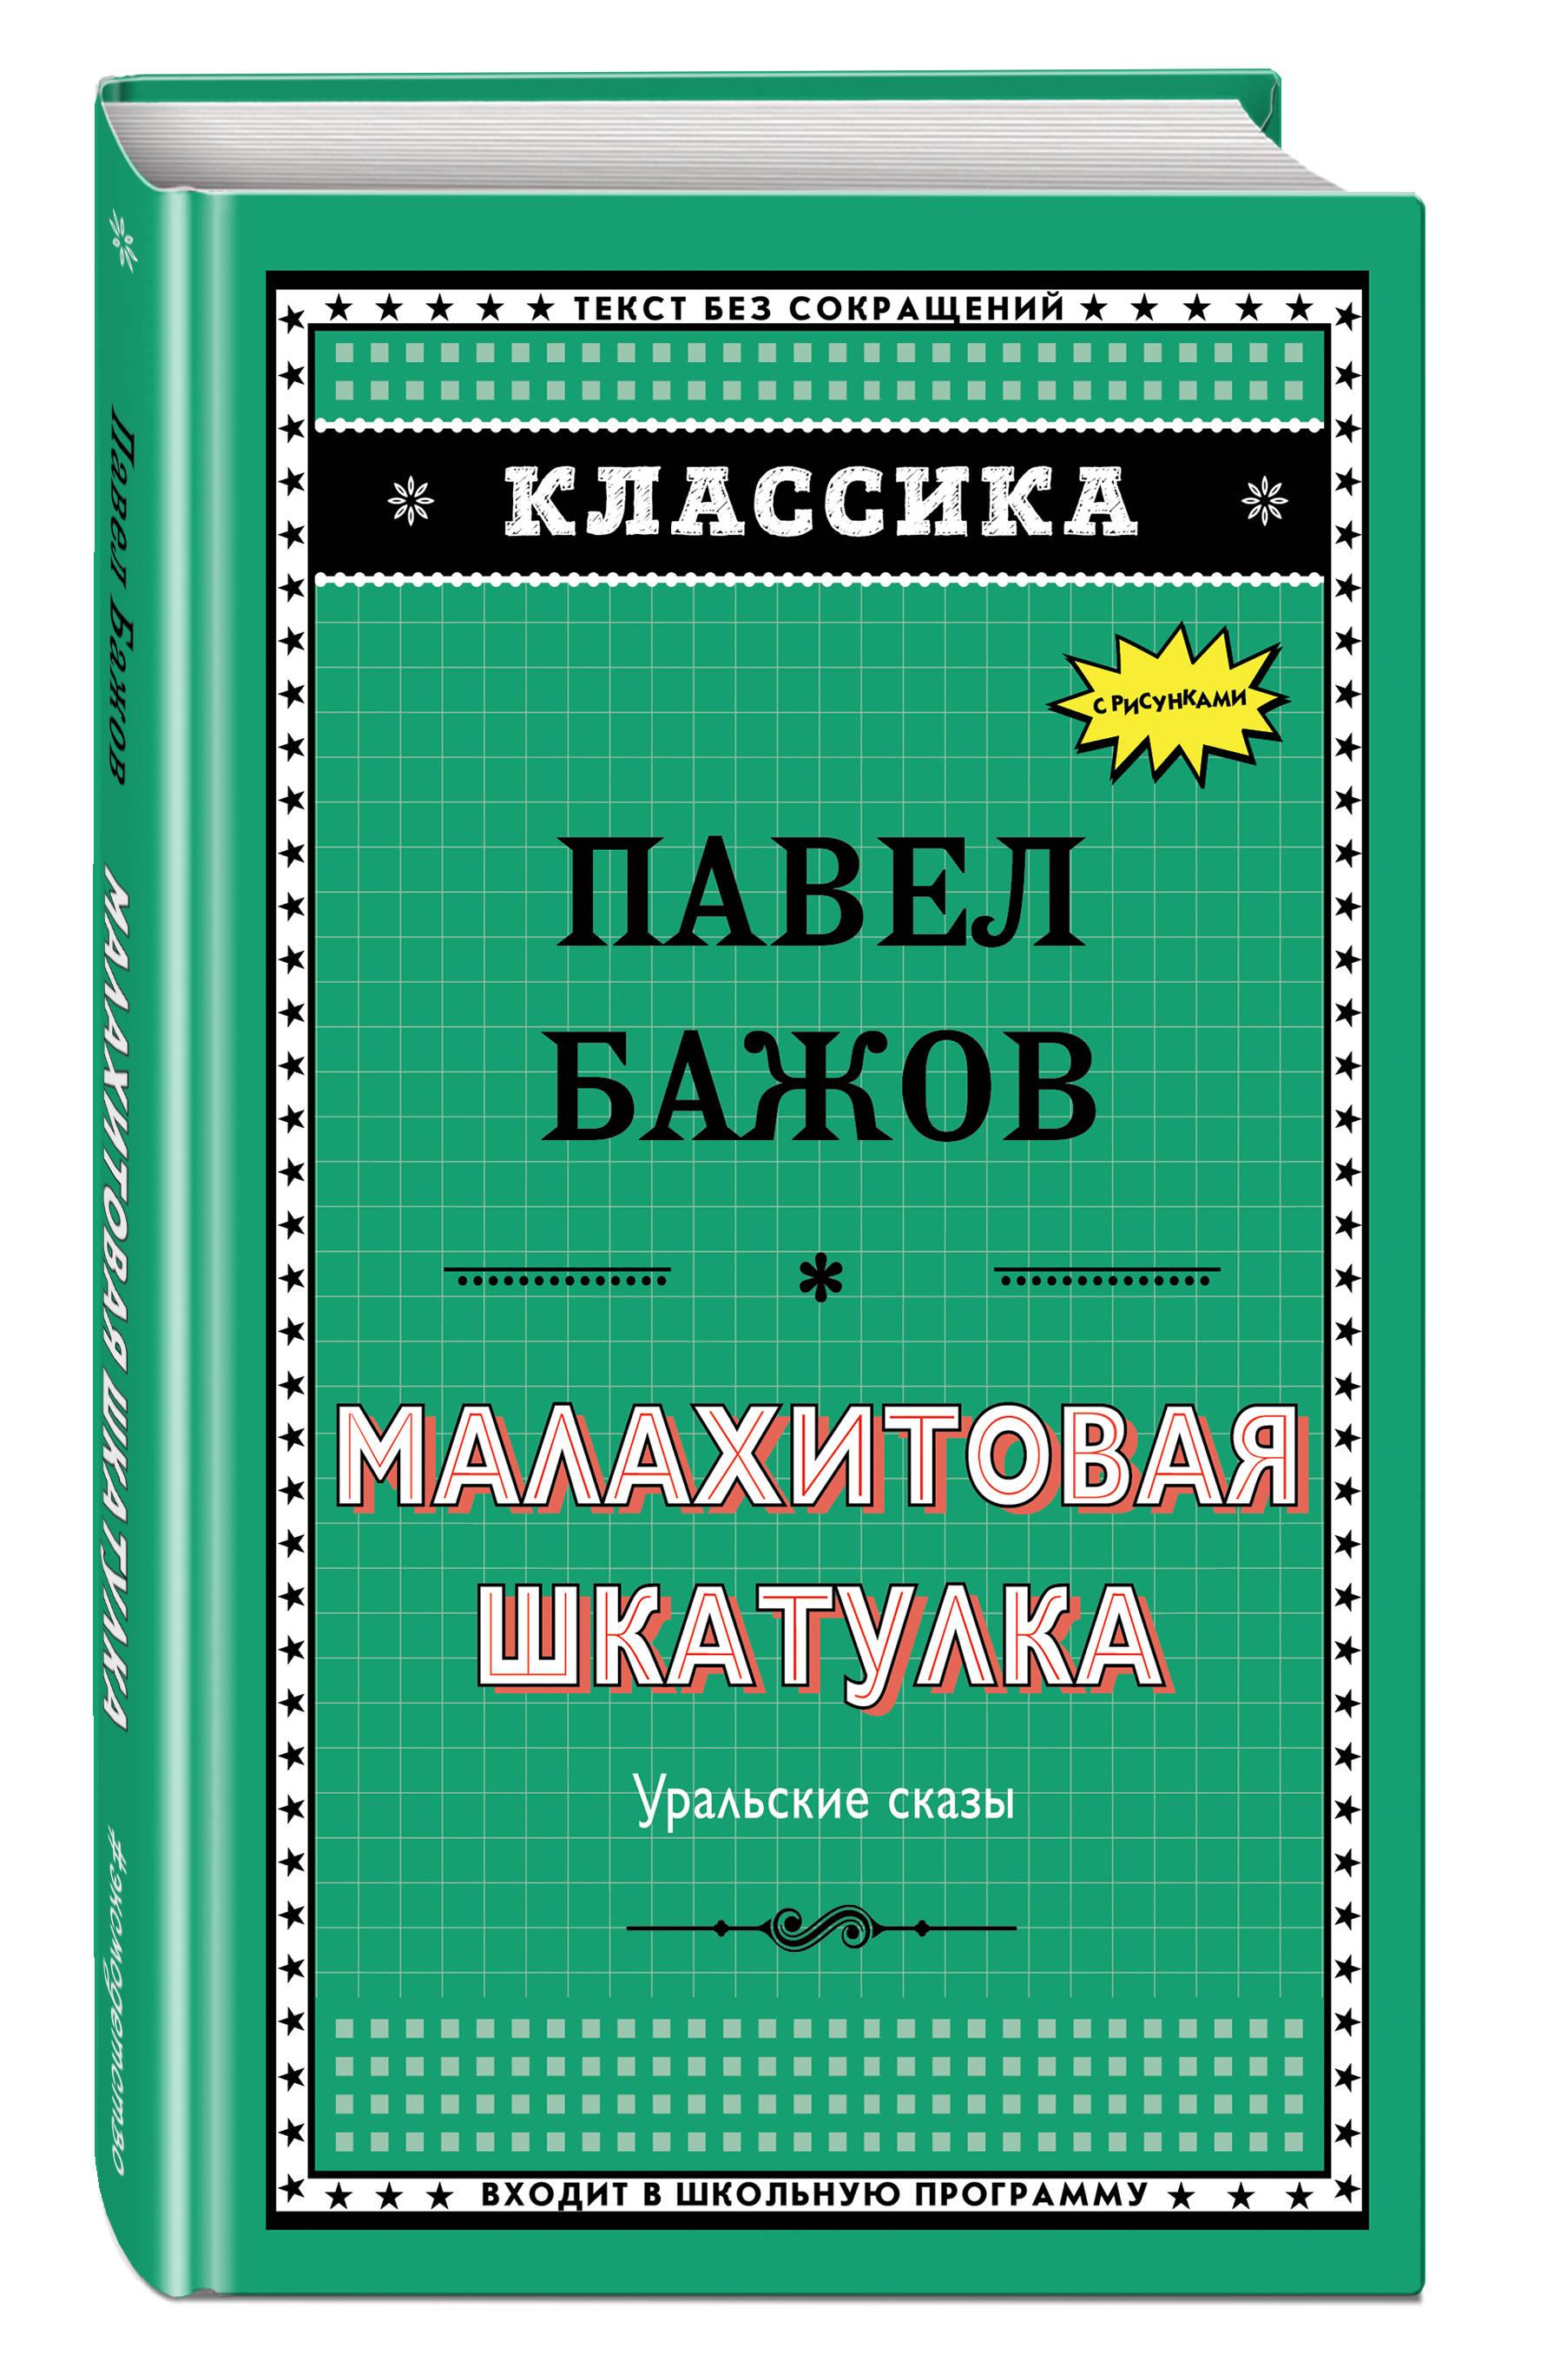 Павел Бажов Малахитовая шкатулка бажов павел петрович малахитовая шкатулка сказы isbn 978 5 389 08830 6